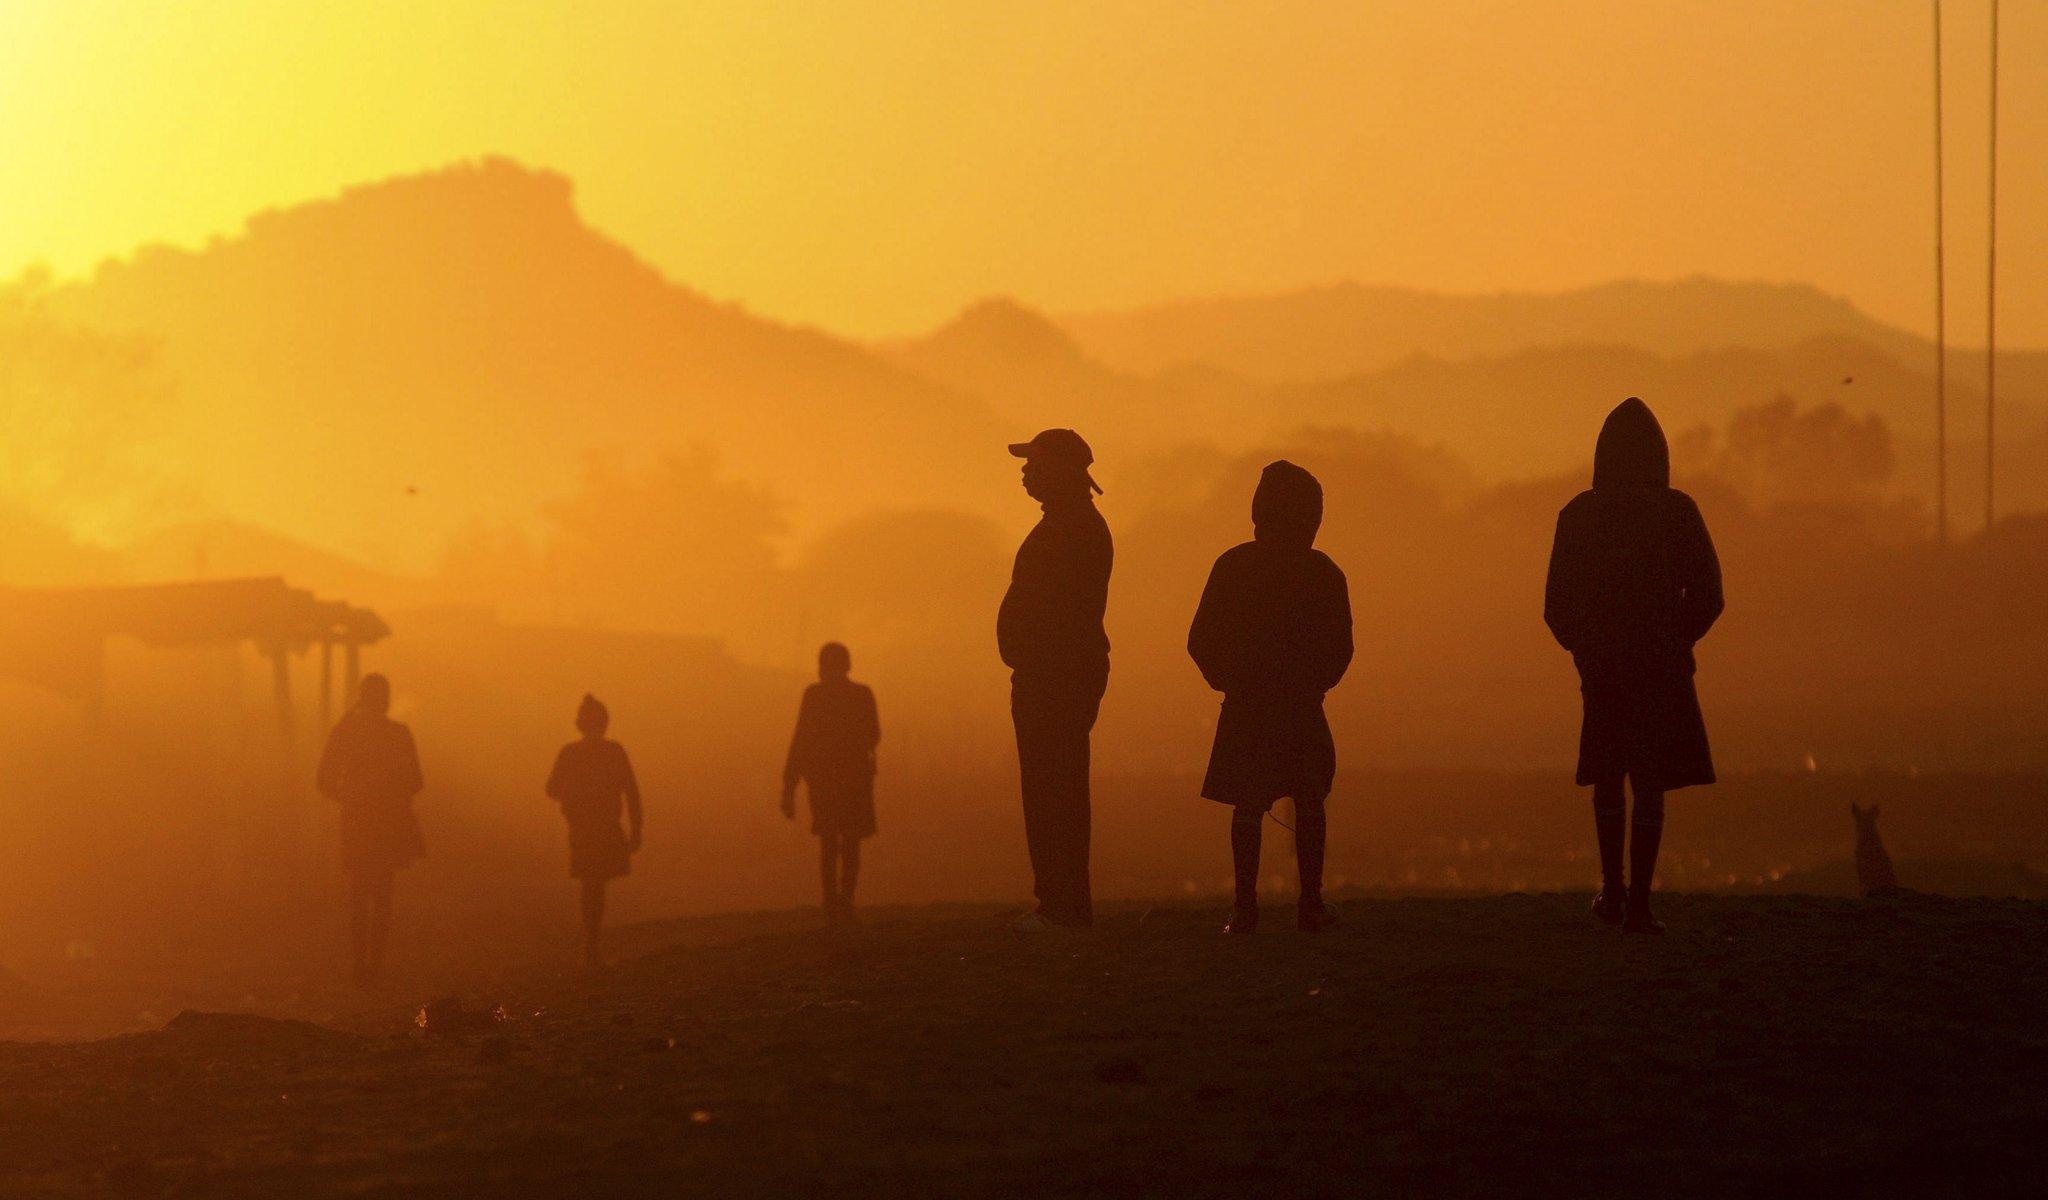 Inequality Explained: Lessons from South Africa's Marikana massacre